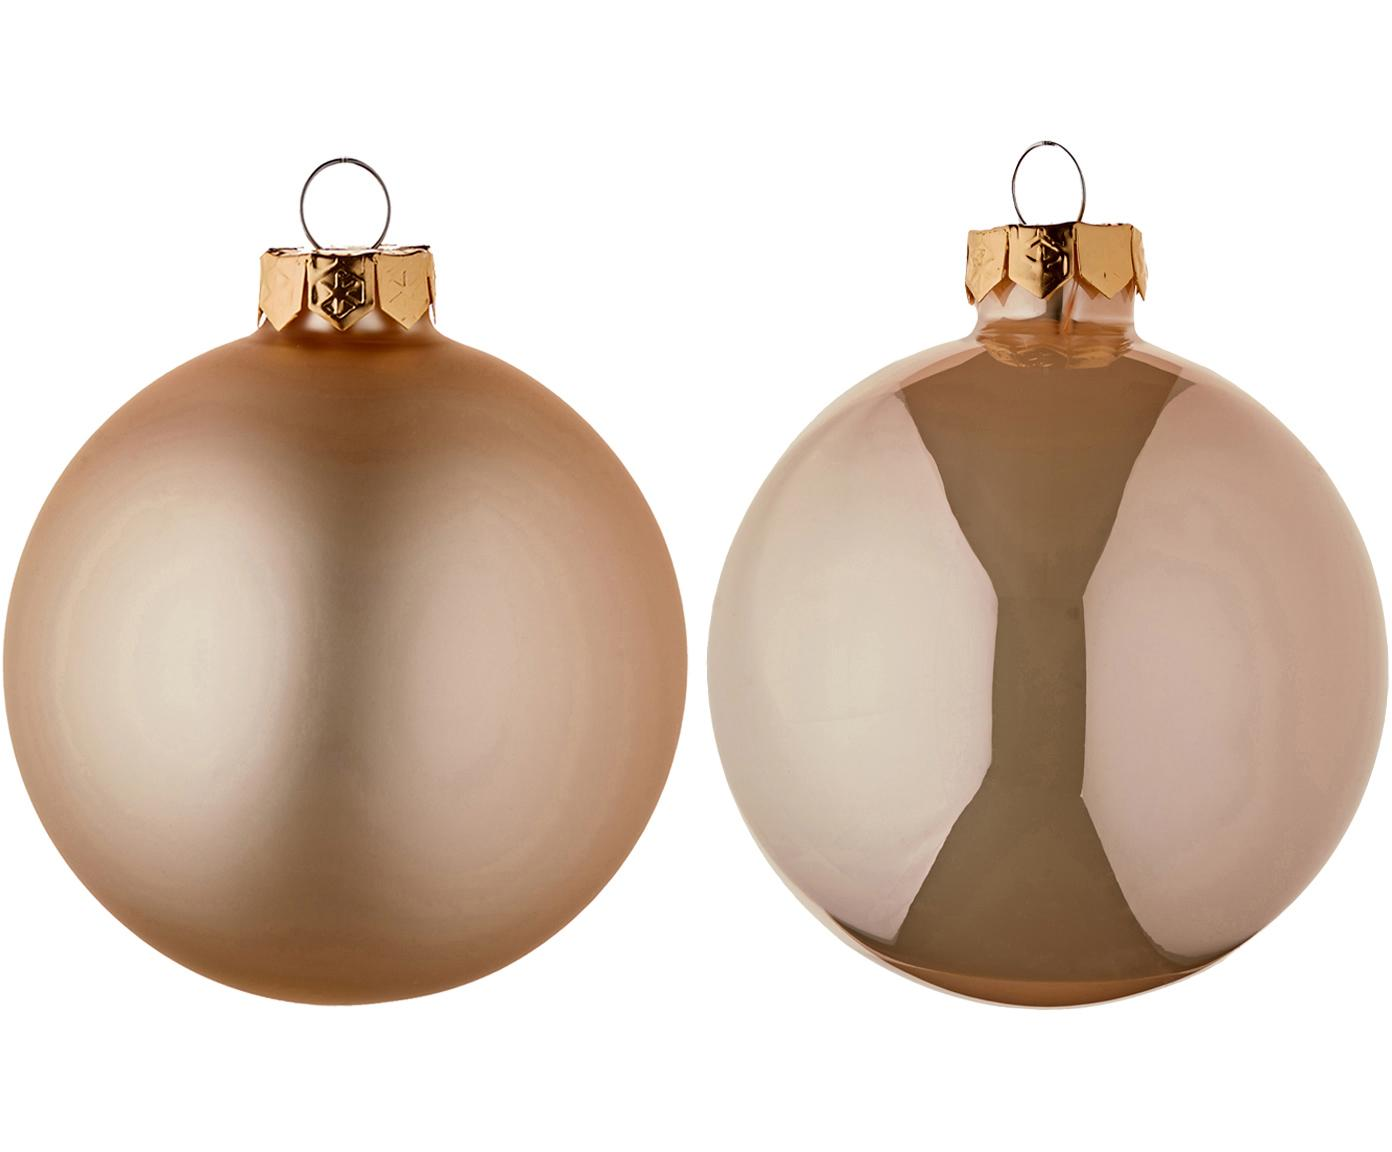 Kerstballenset Evergreen, 6-delig, Crèmekleurig, Ø 8 cm